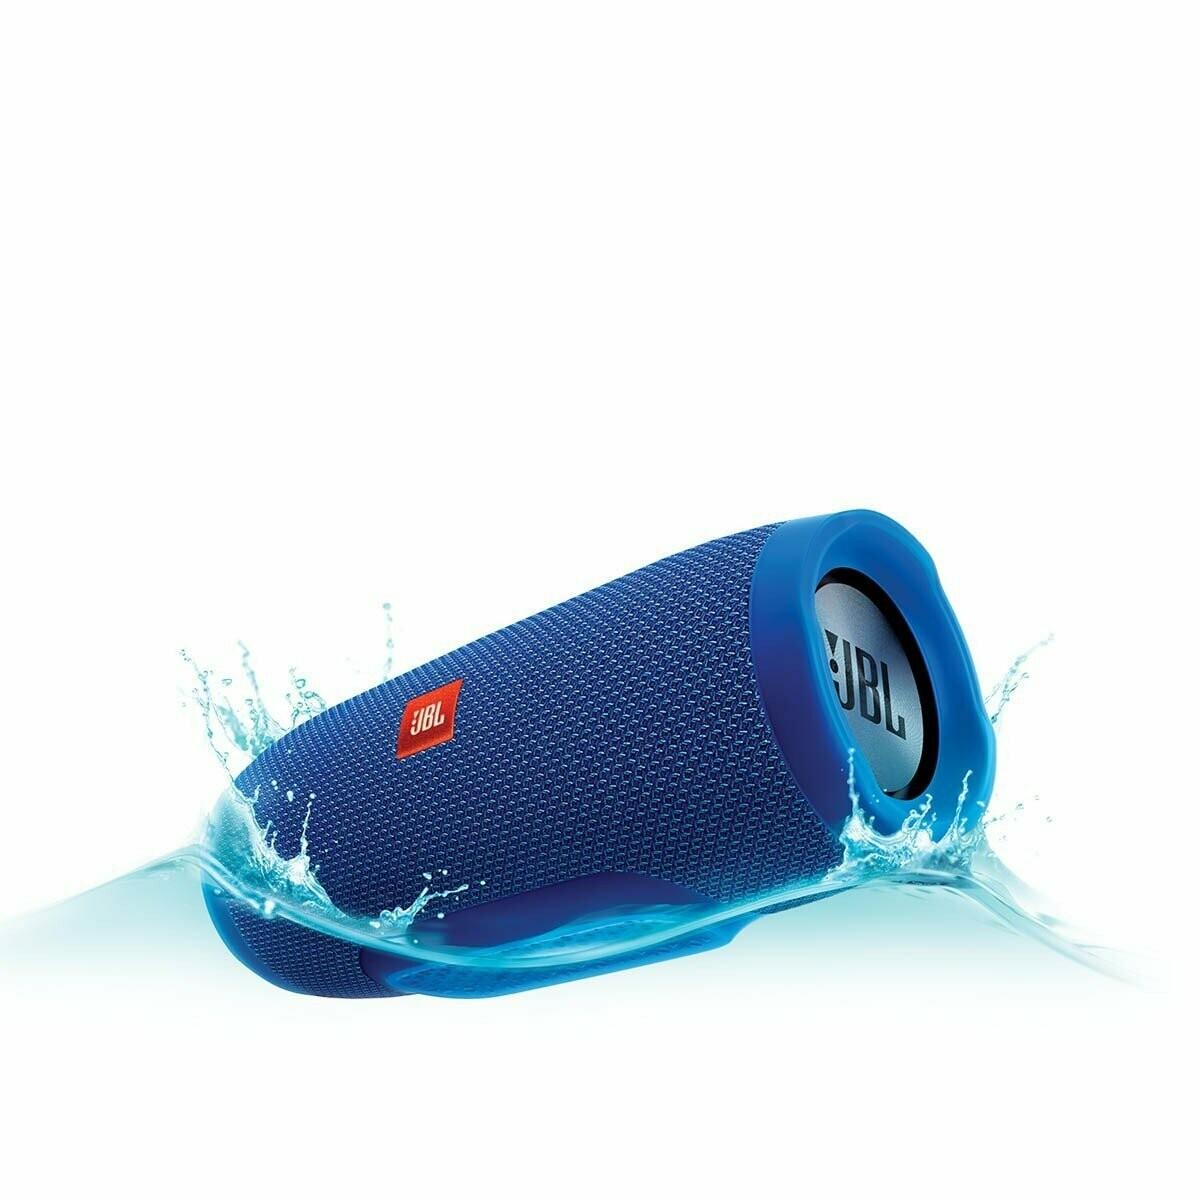 JBL Charge 3 Wireless Portable Speaker, Blue